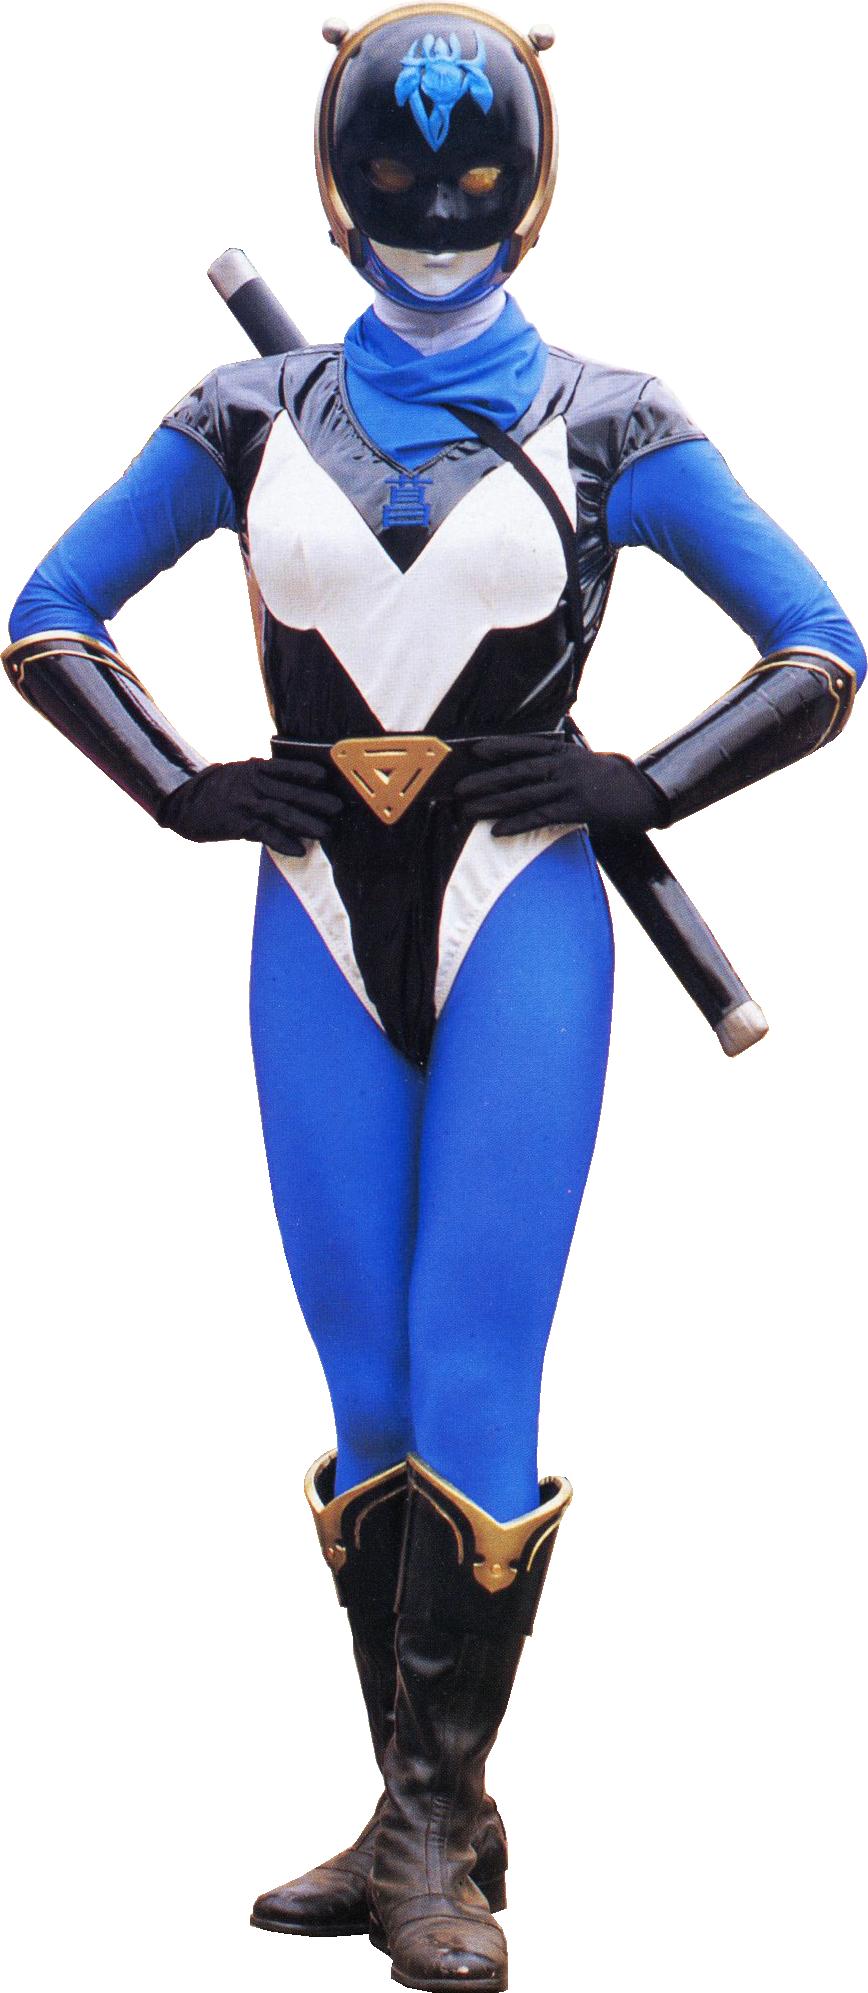 Hana-blue